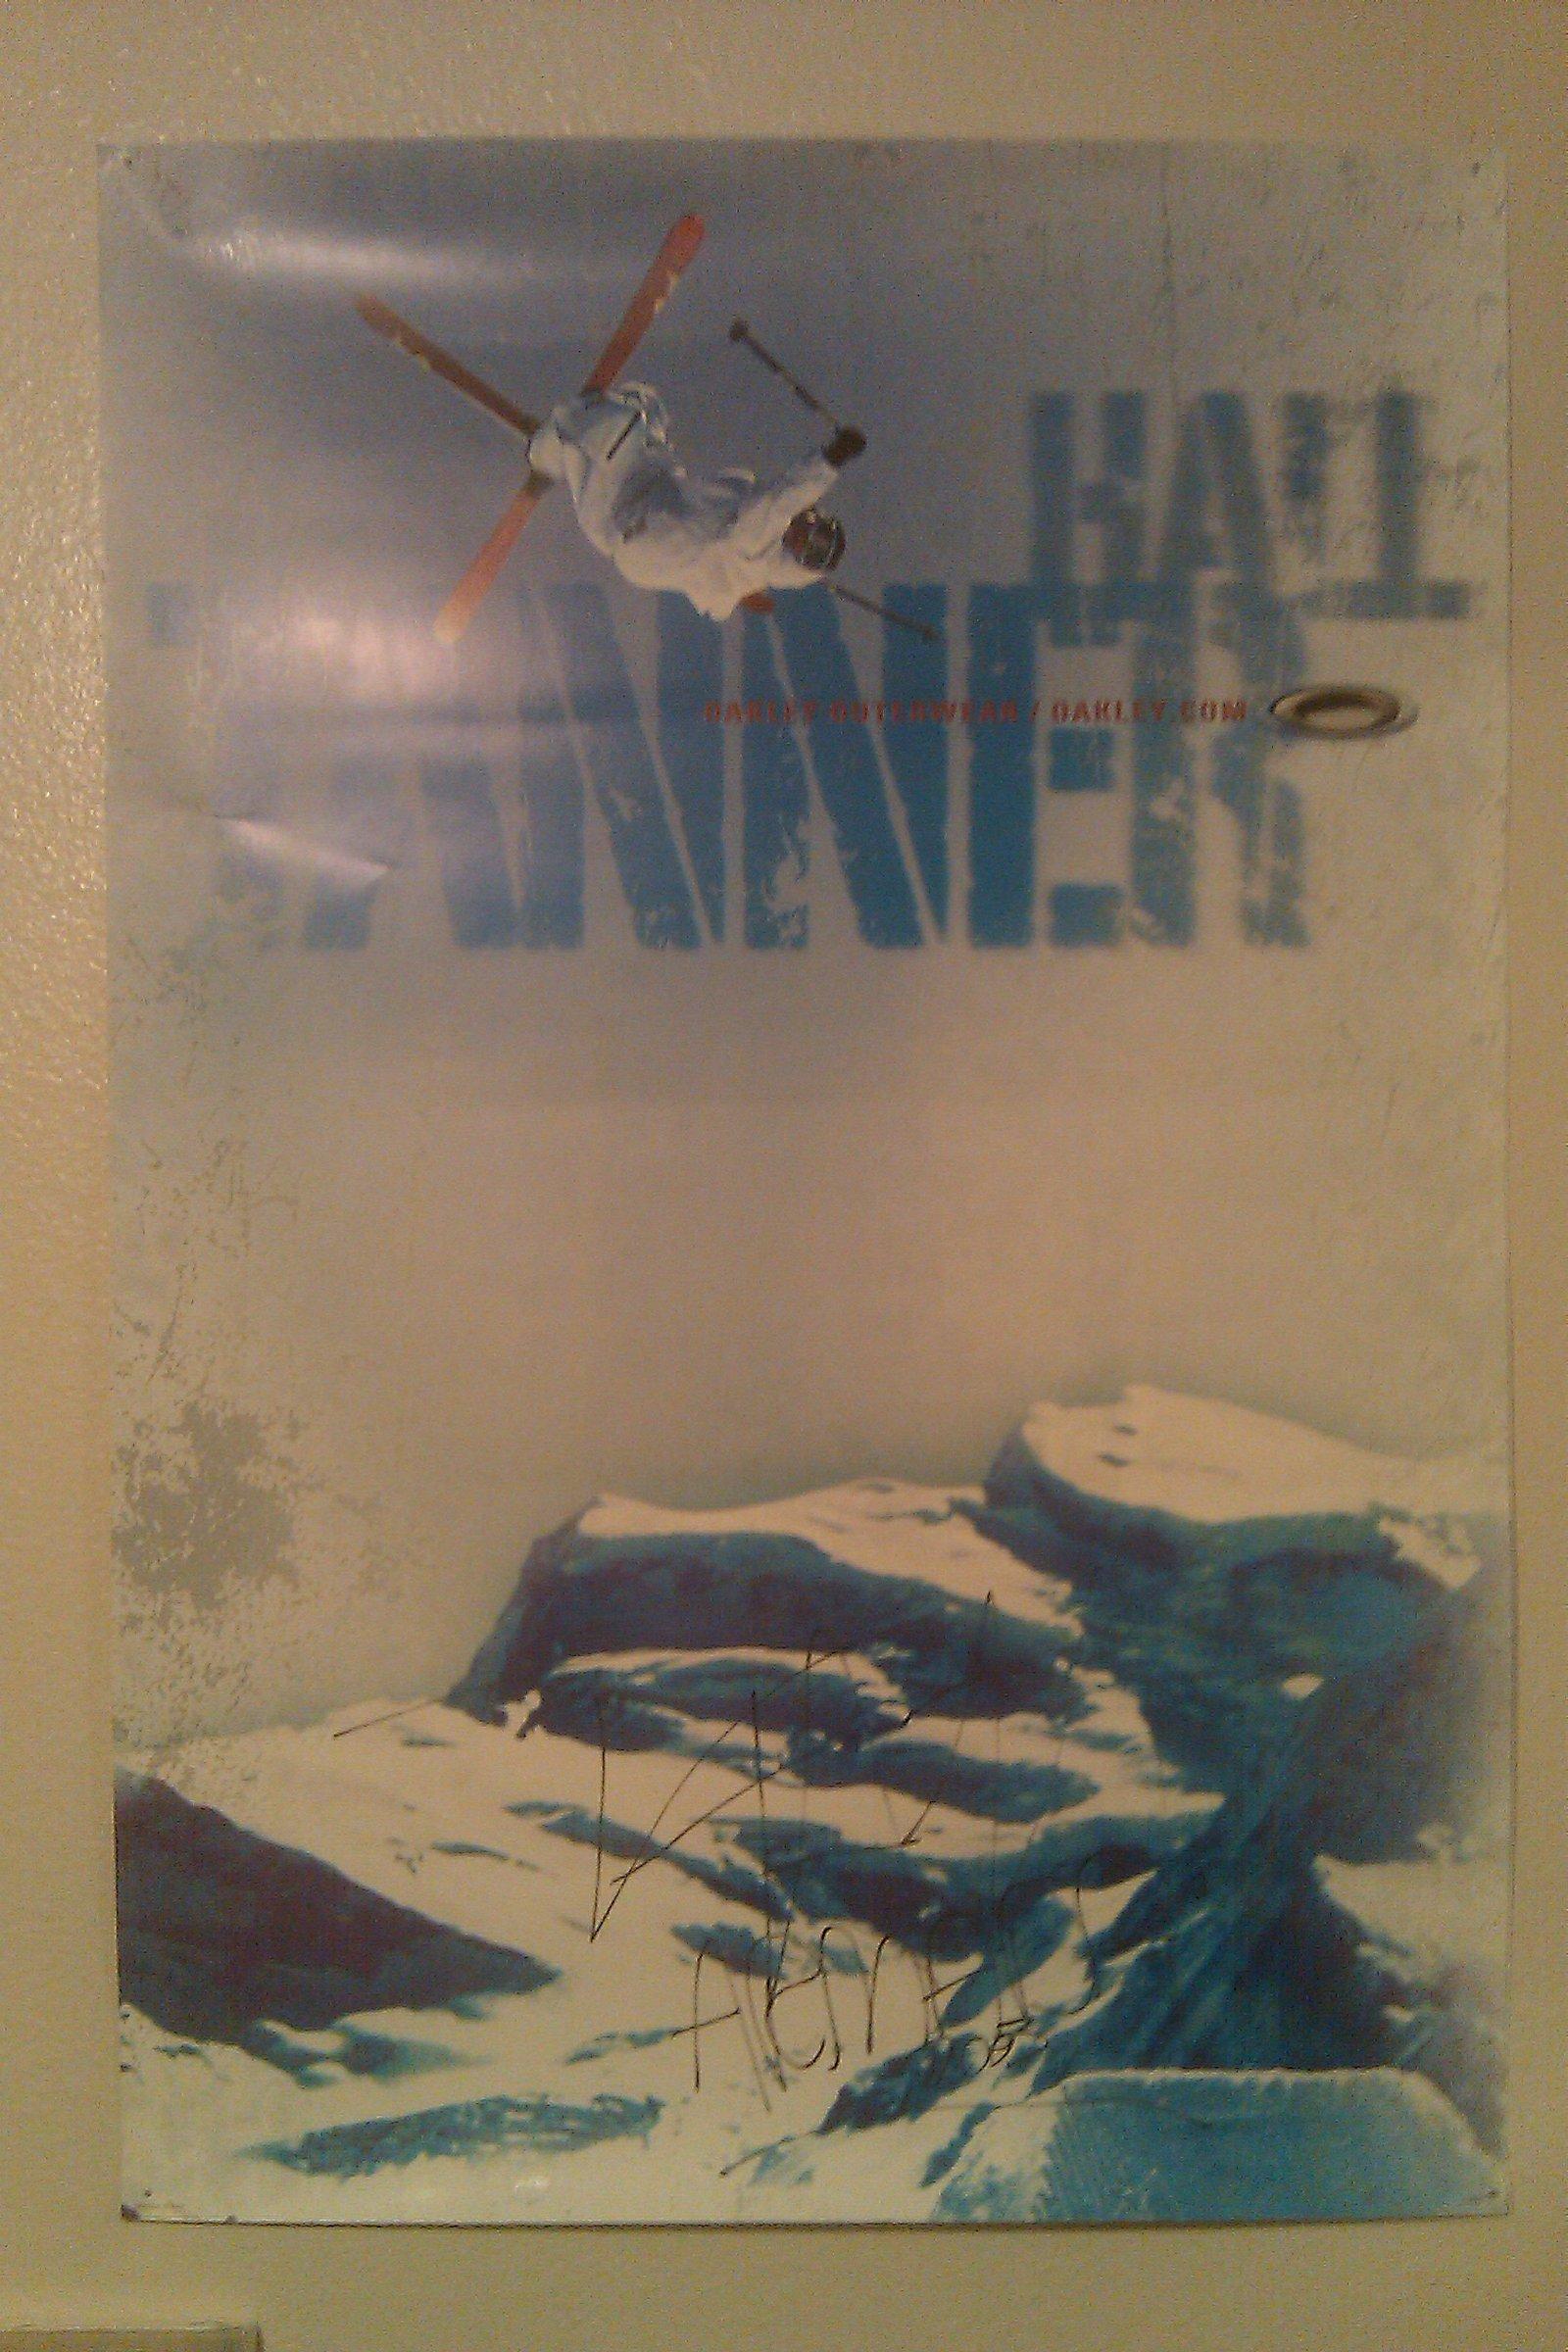 Oakley Tanner Hall 2003